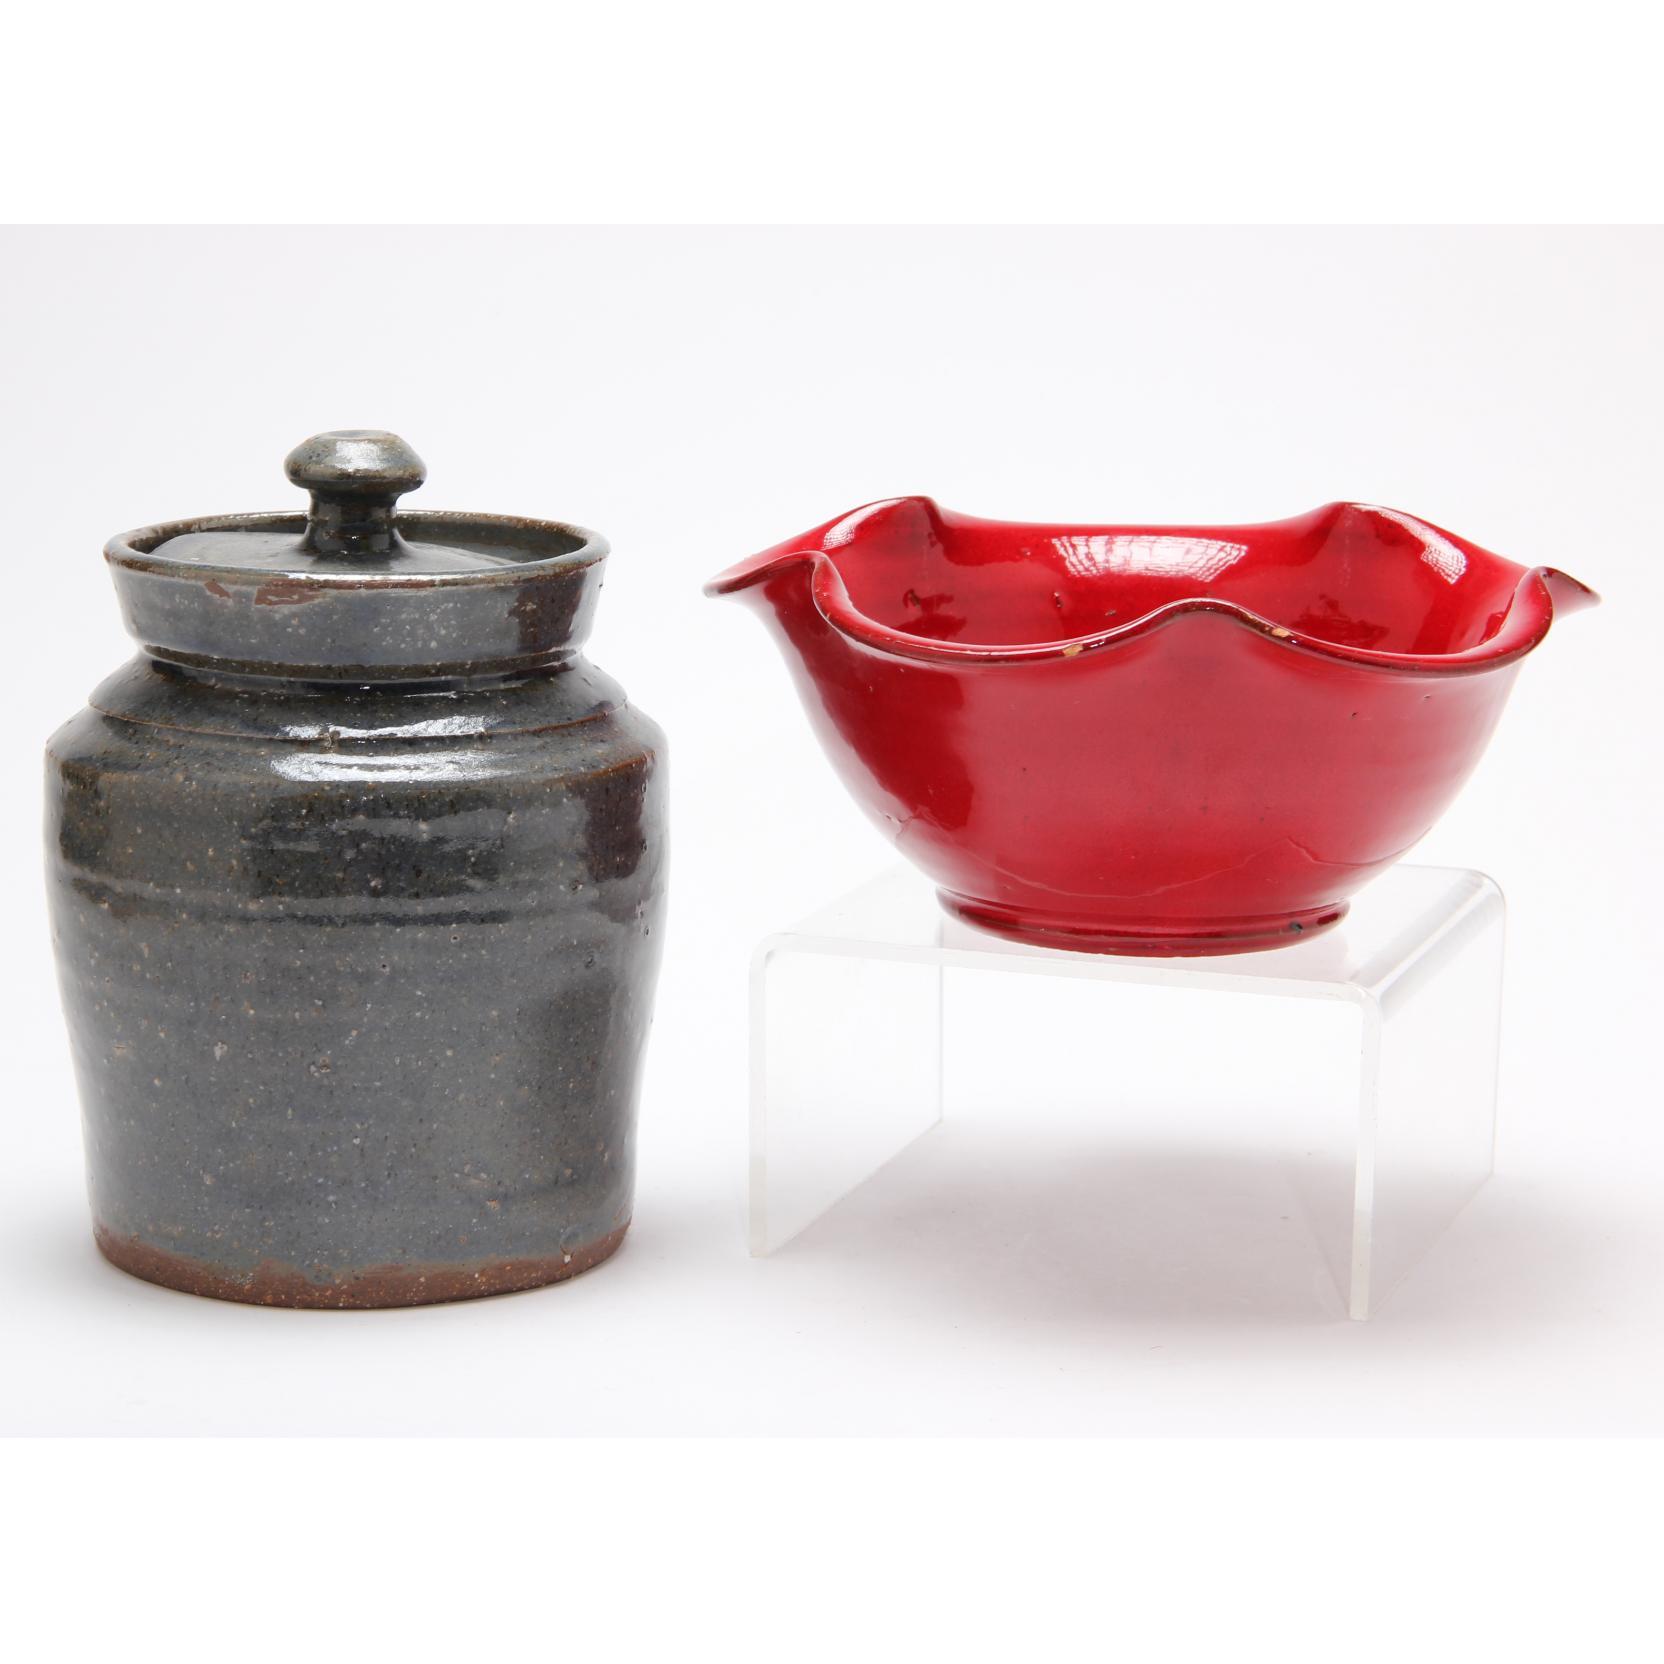 burlon-craig-and-owen-pottery-serving-dishes